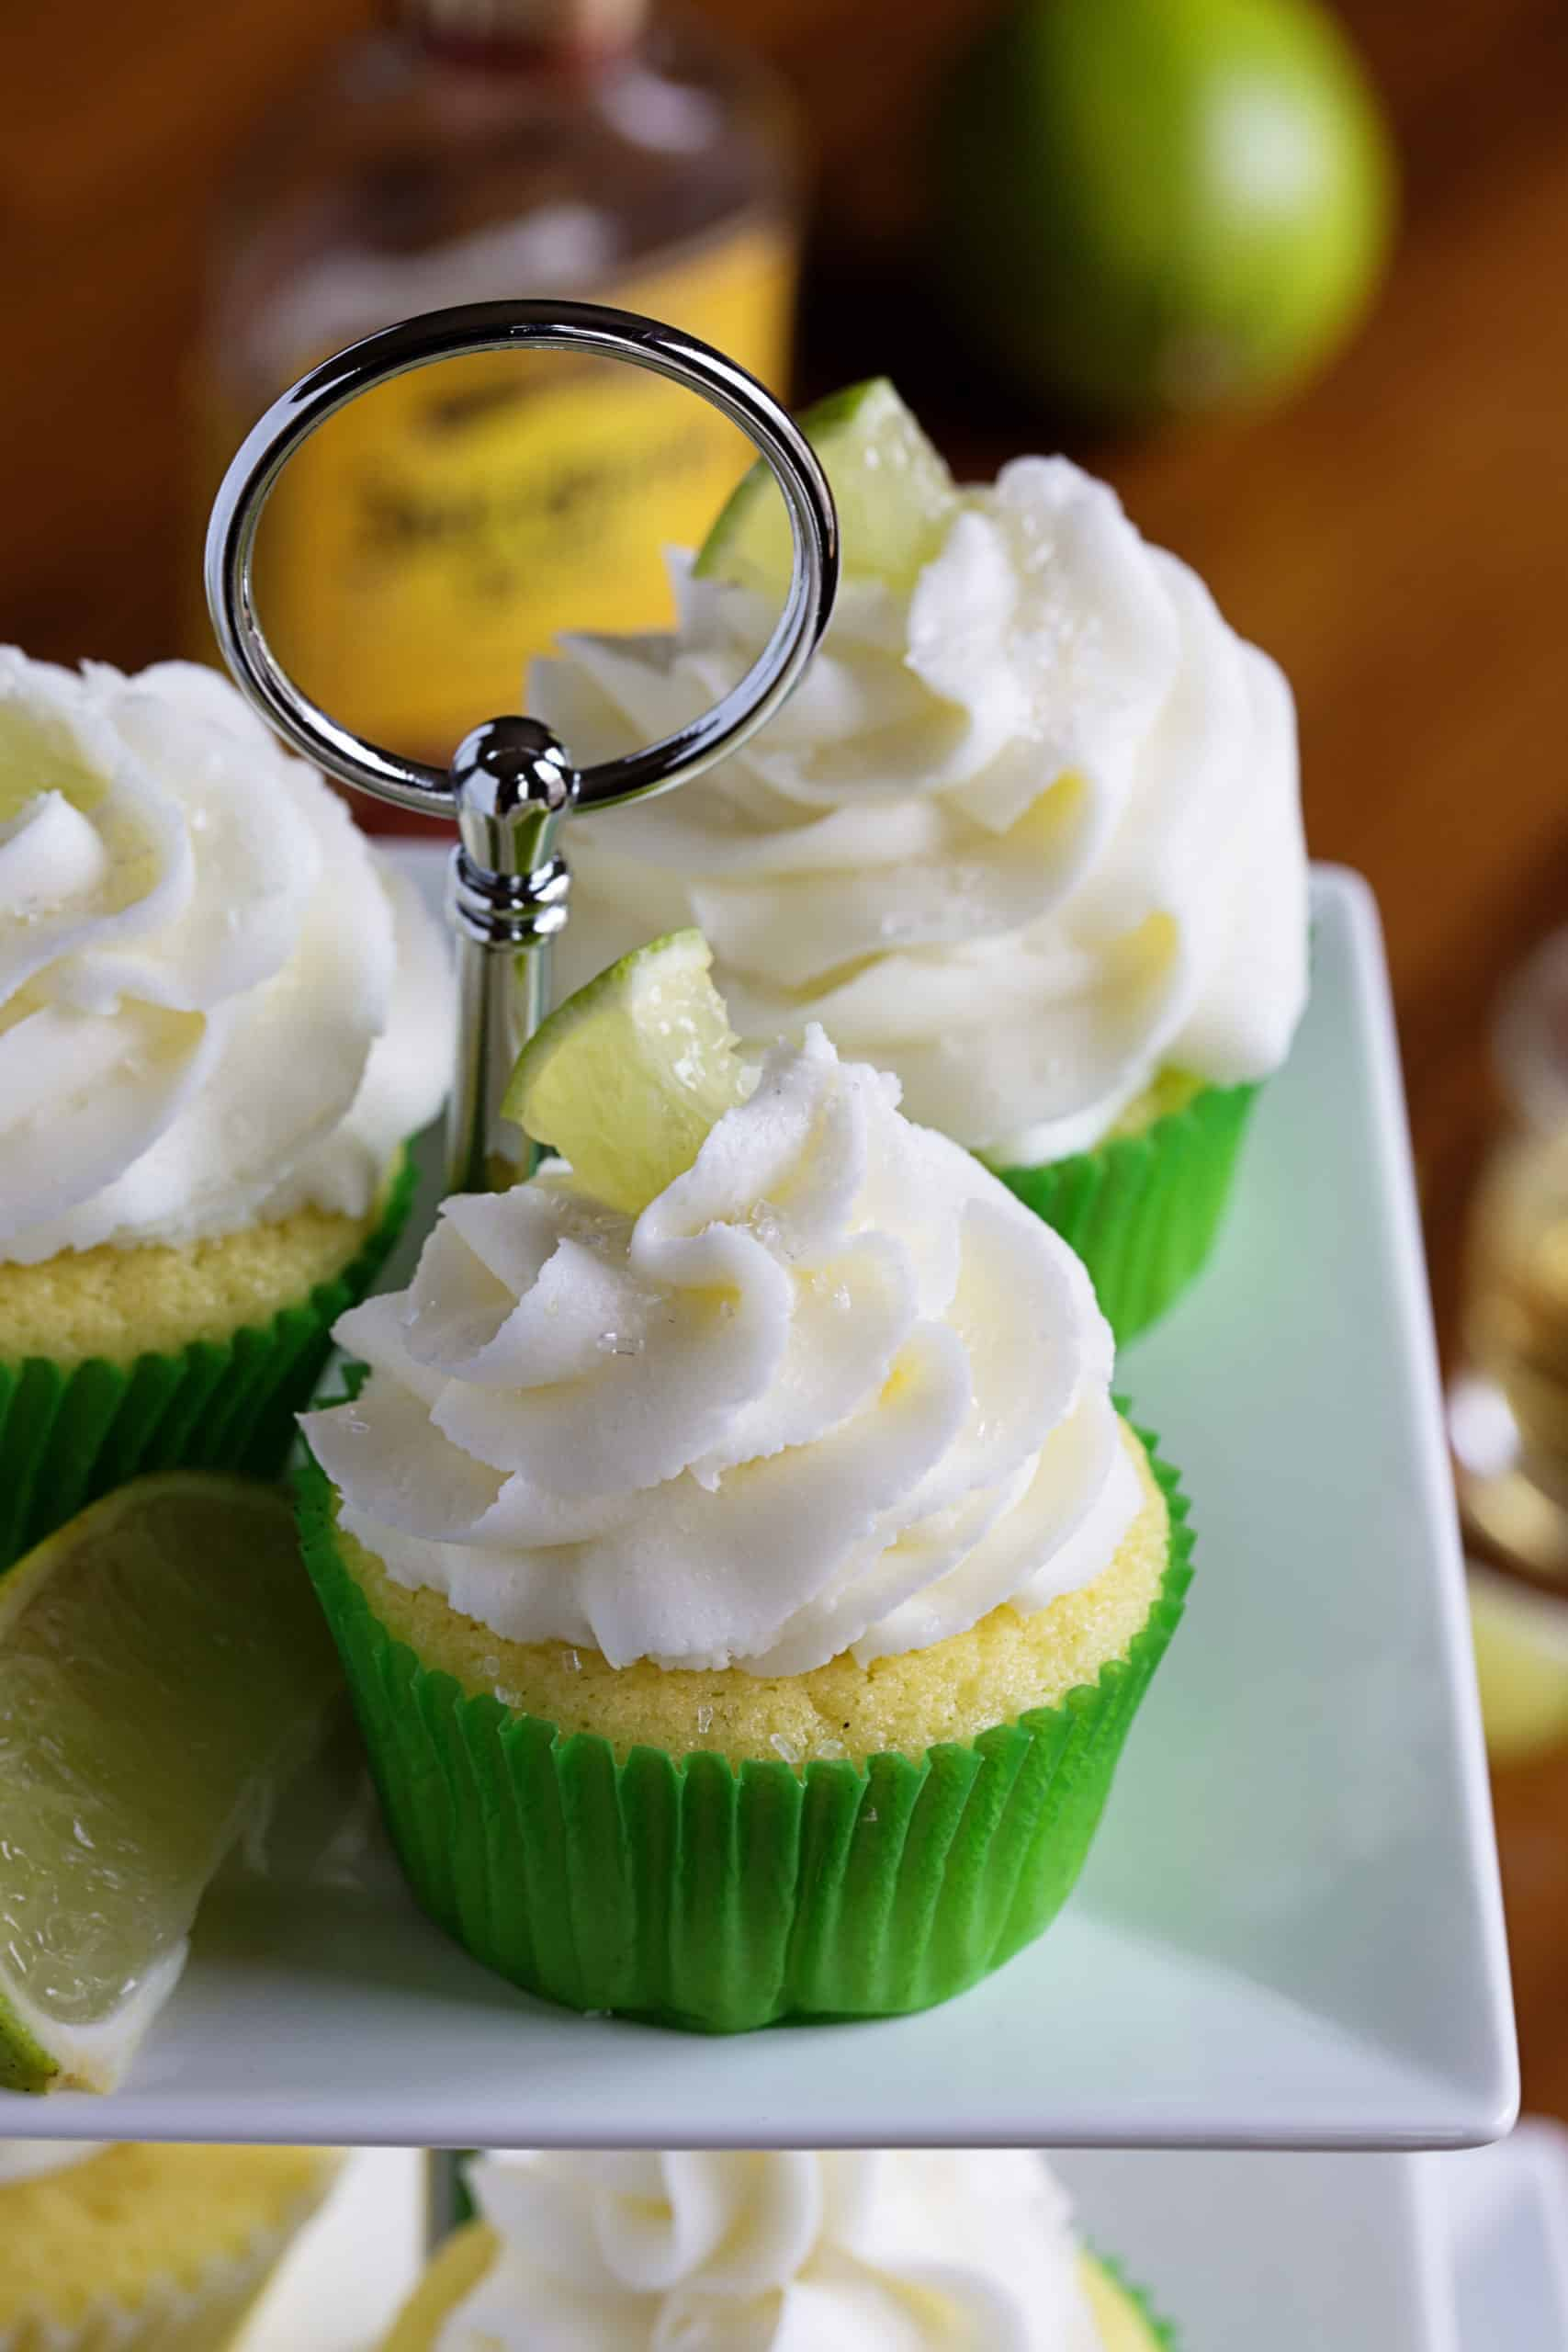 Cupcakes on Pedestal